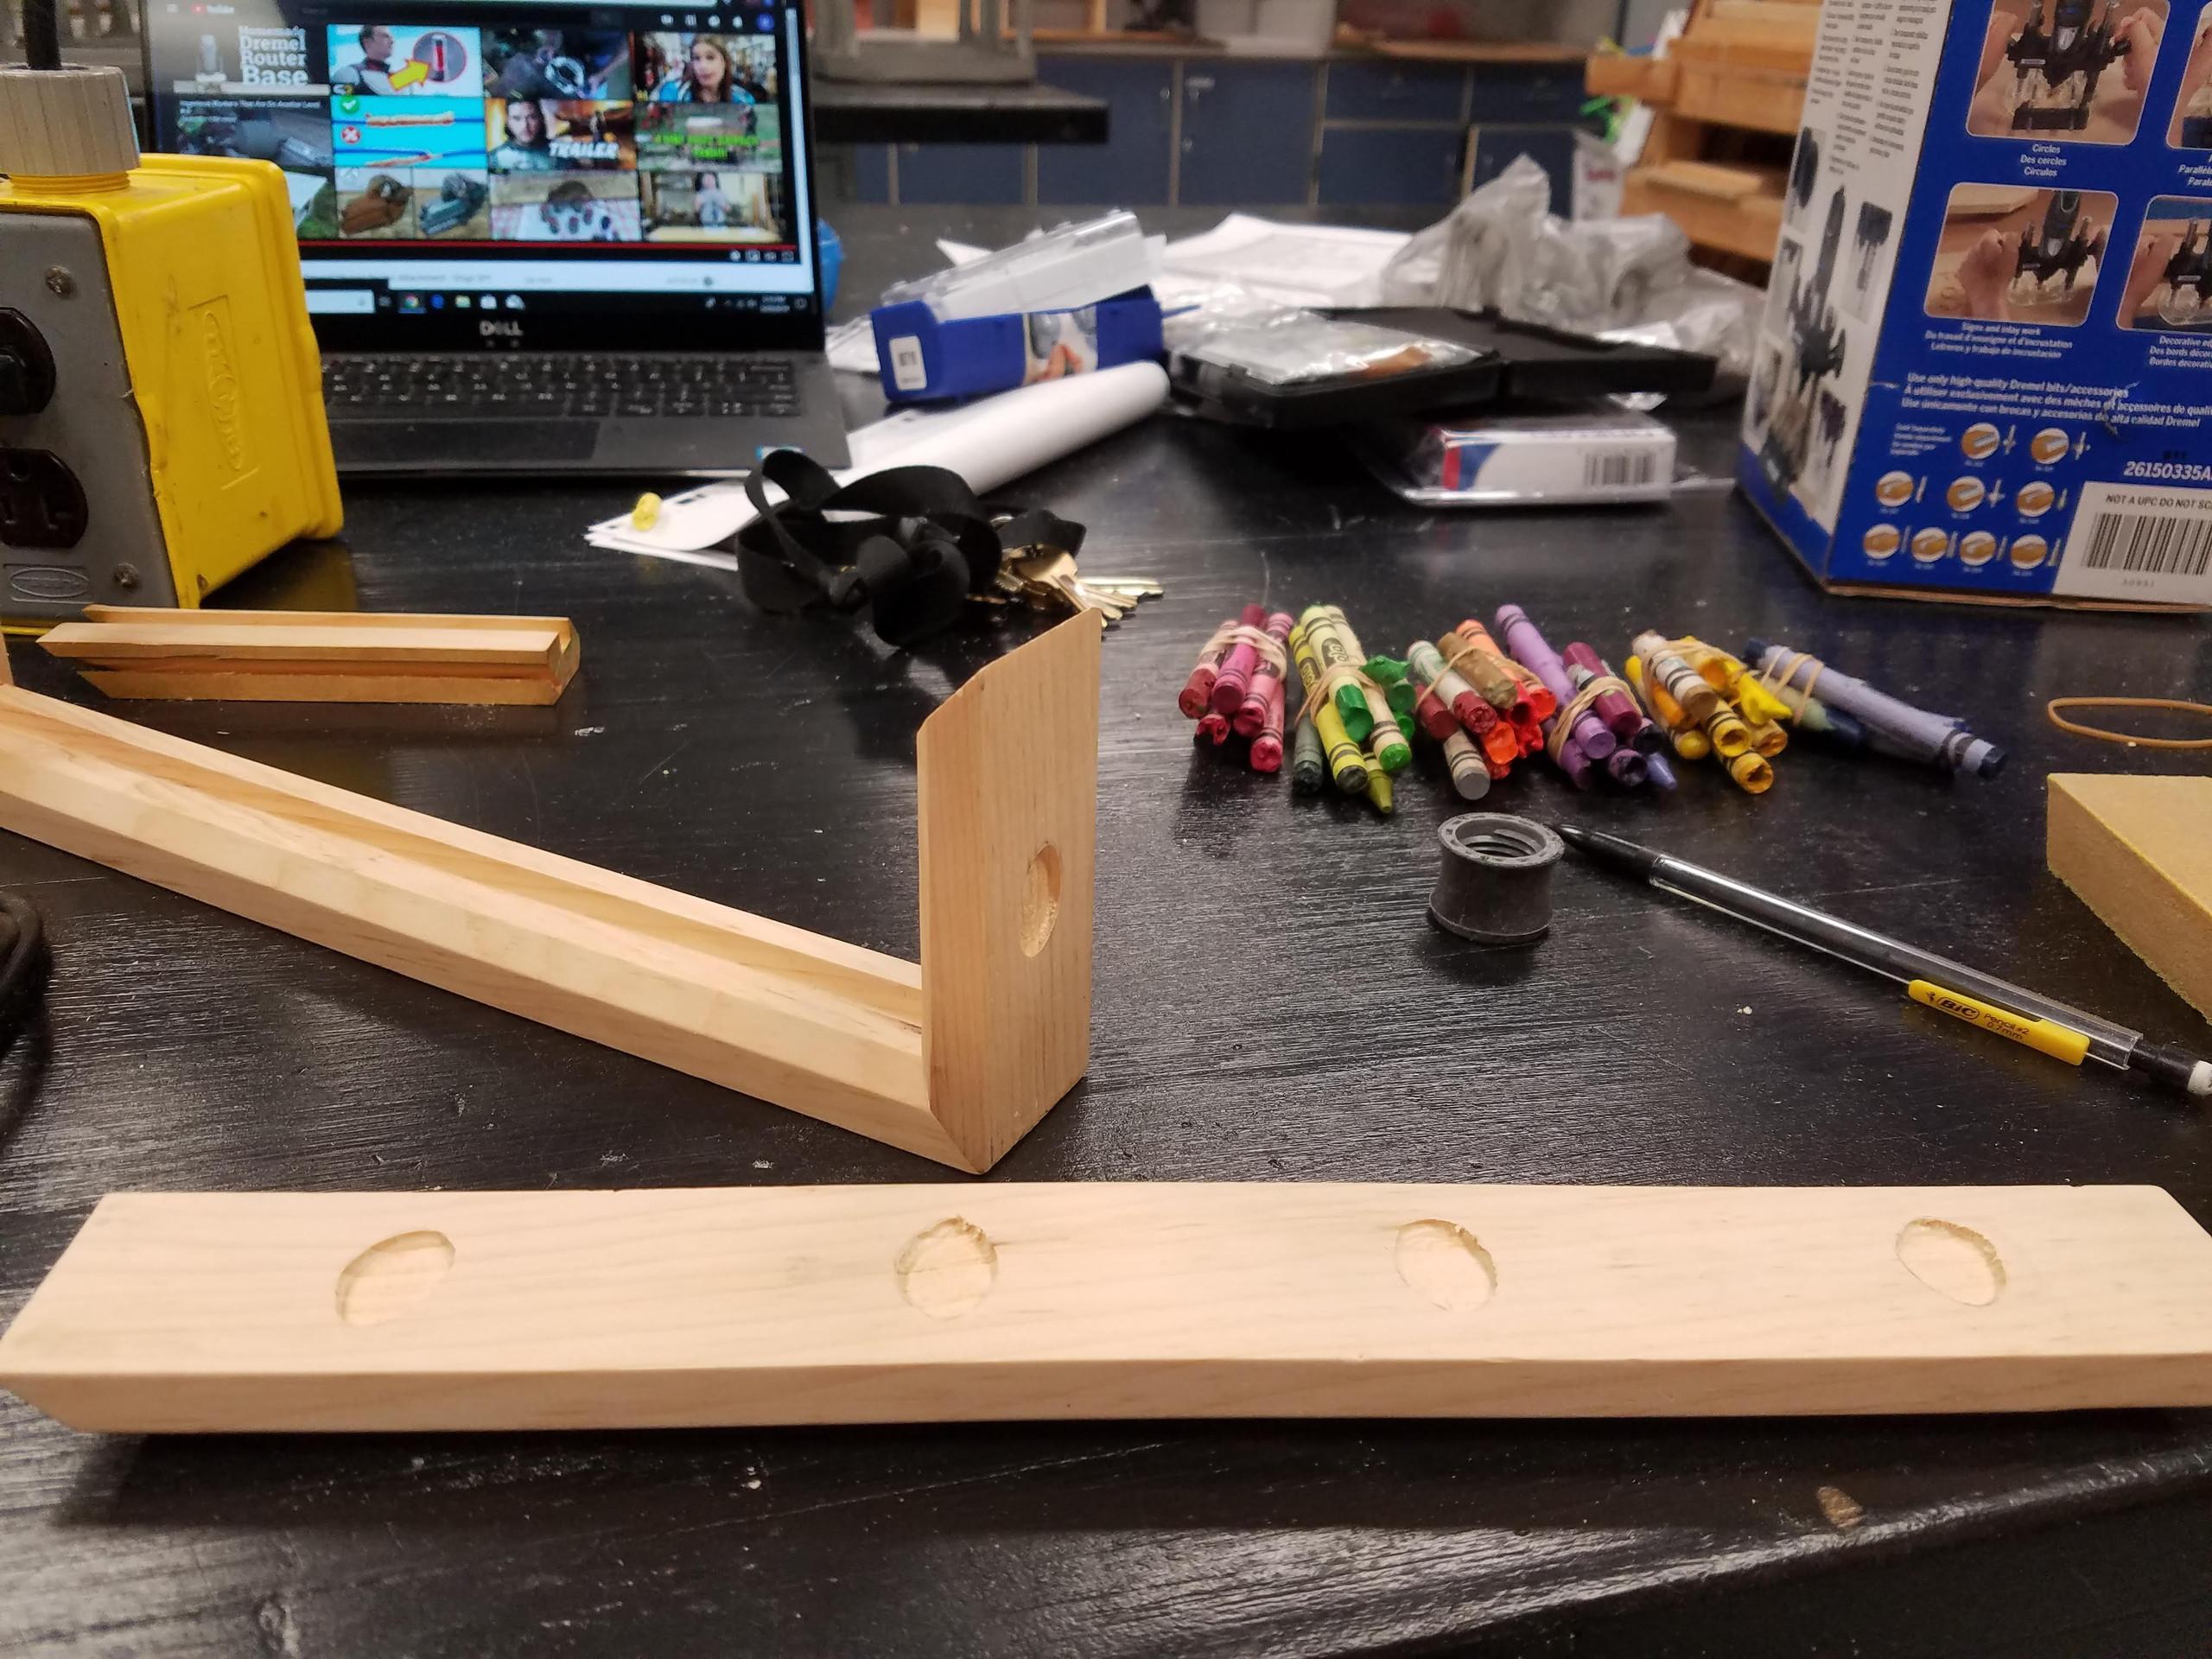 wood shop, DIY, Wood projects, wood frame, shadow box, crayola crayon, dremel router, inlay, epoxy